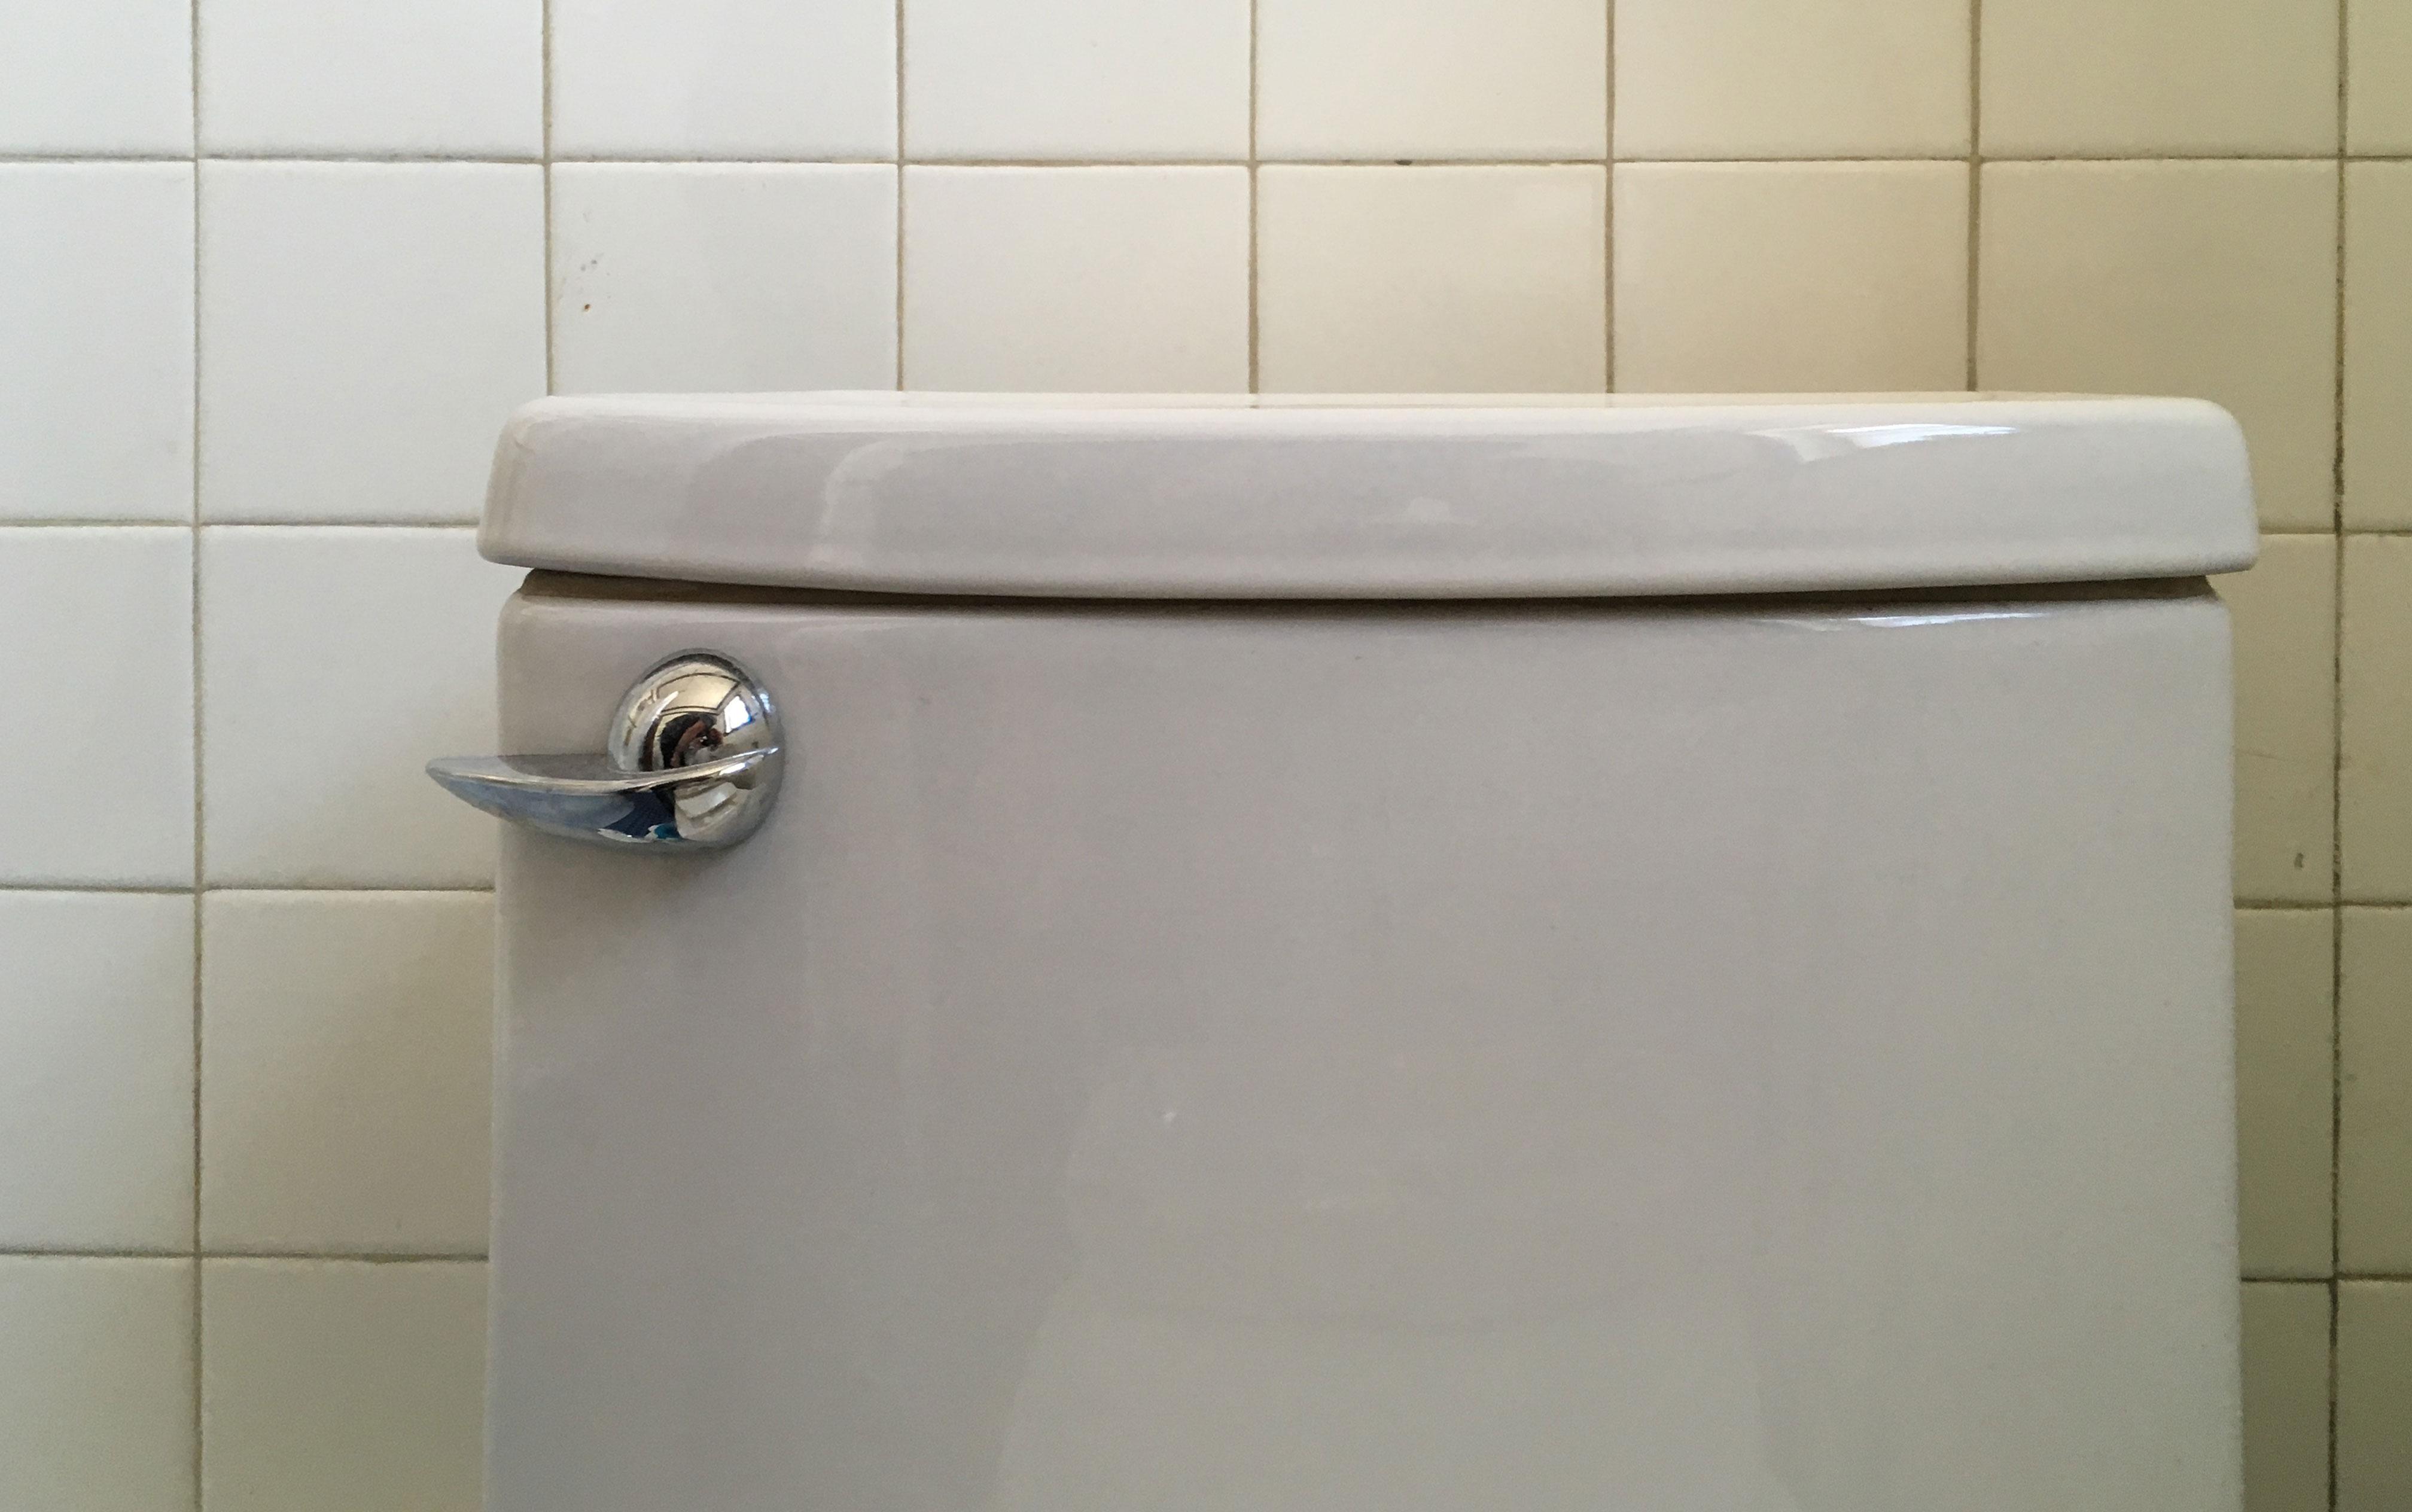 Review American Standard 735125 400 020 Toilet Tank Lid